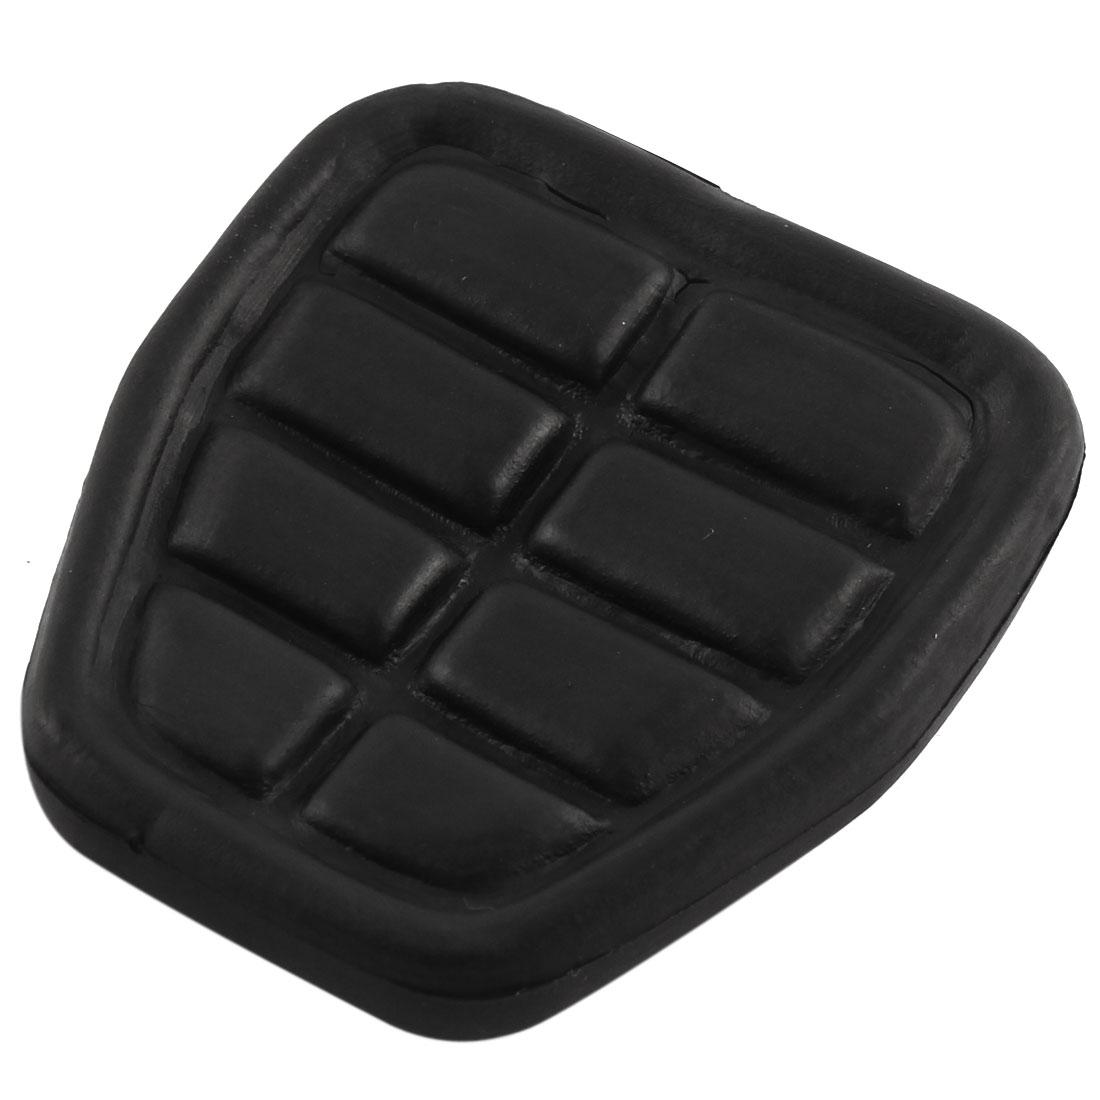 Clutch Brake Pedal Pad Black Rubber Set 321721173 for Audi 80